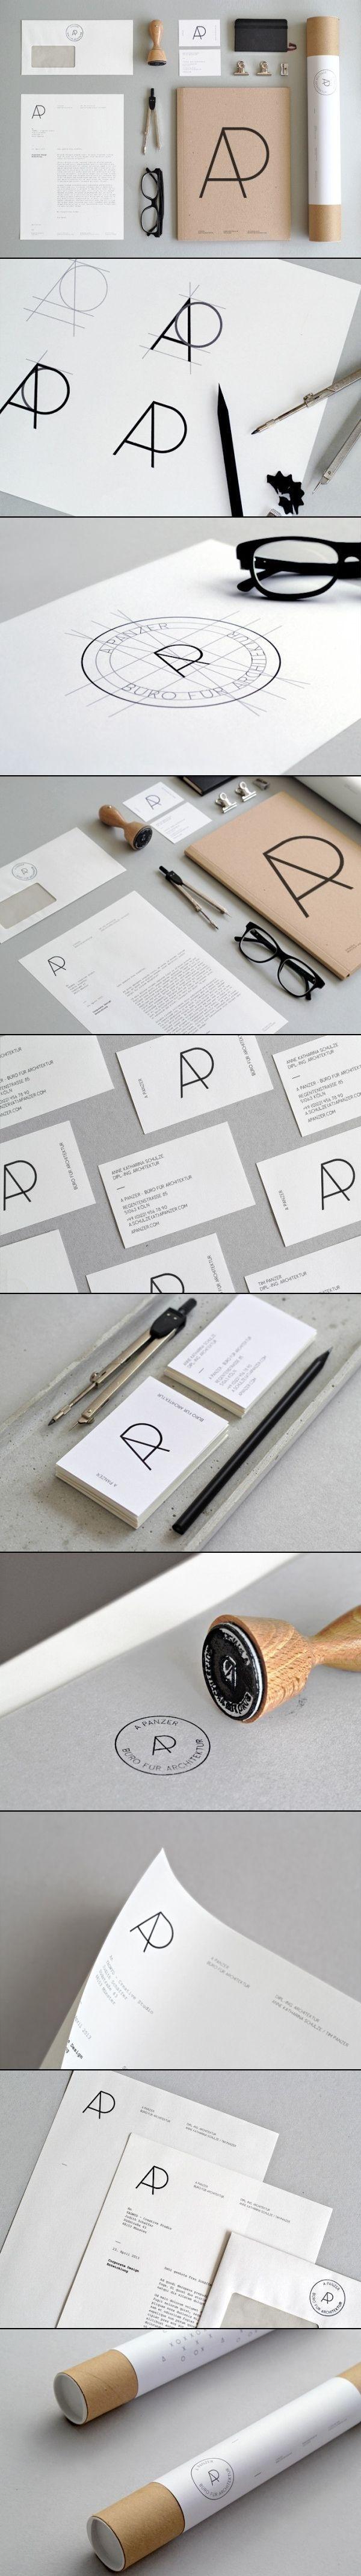 AP #logo #identity #branding